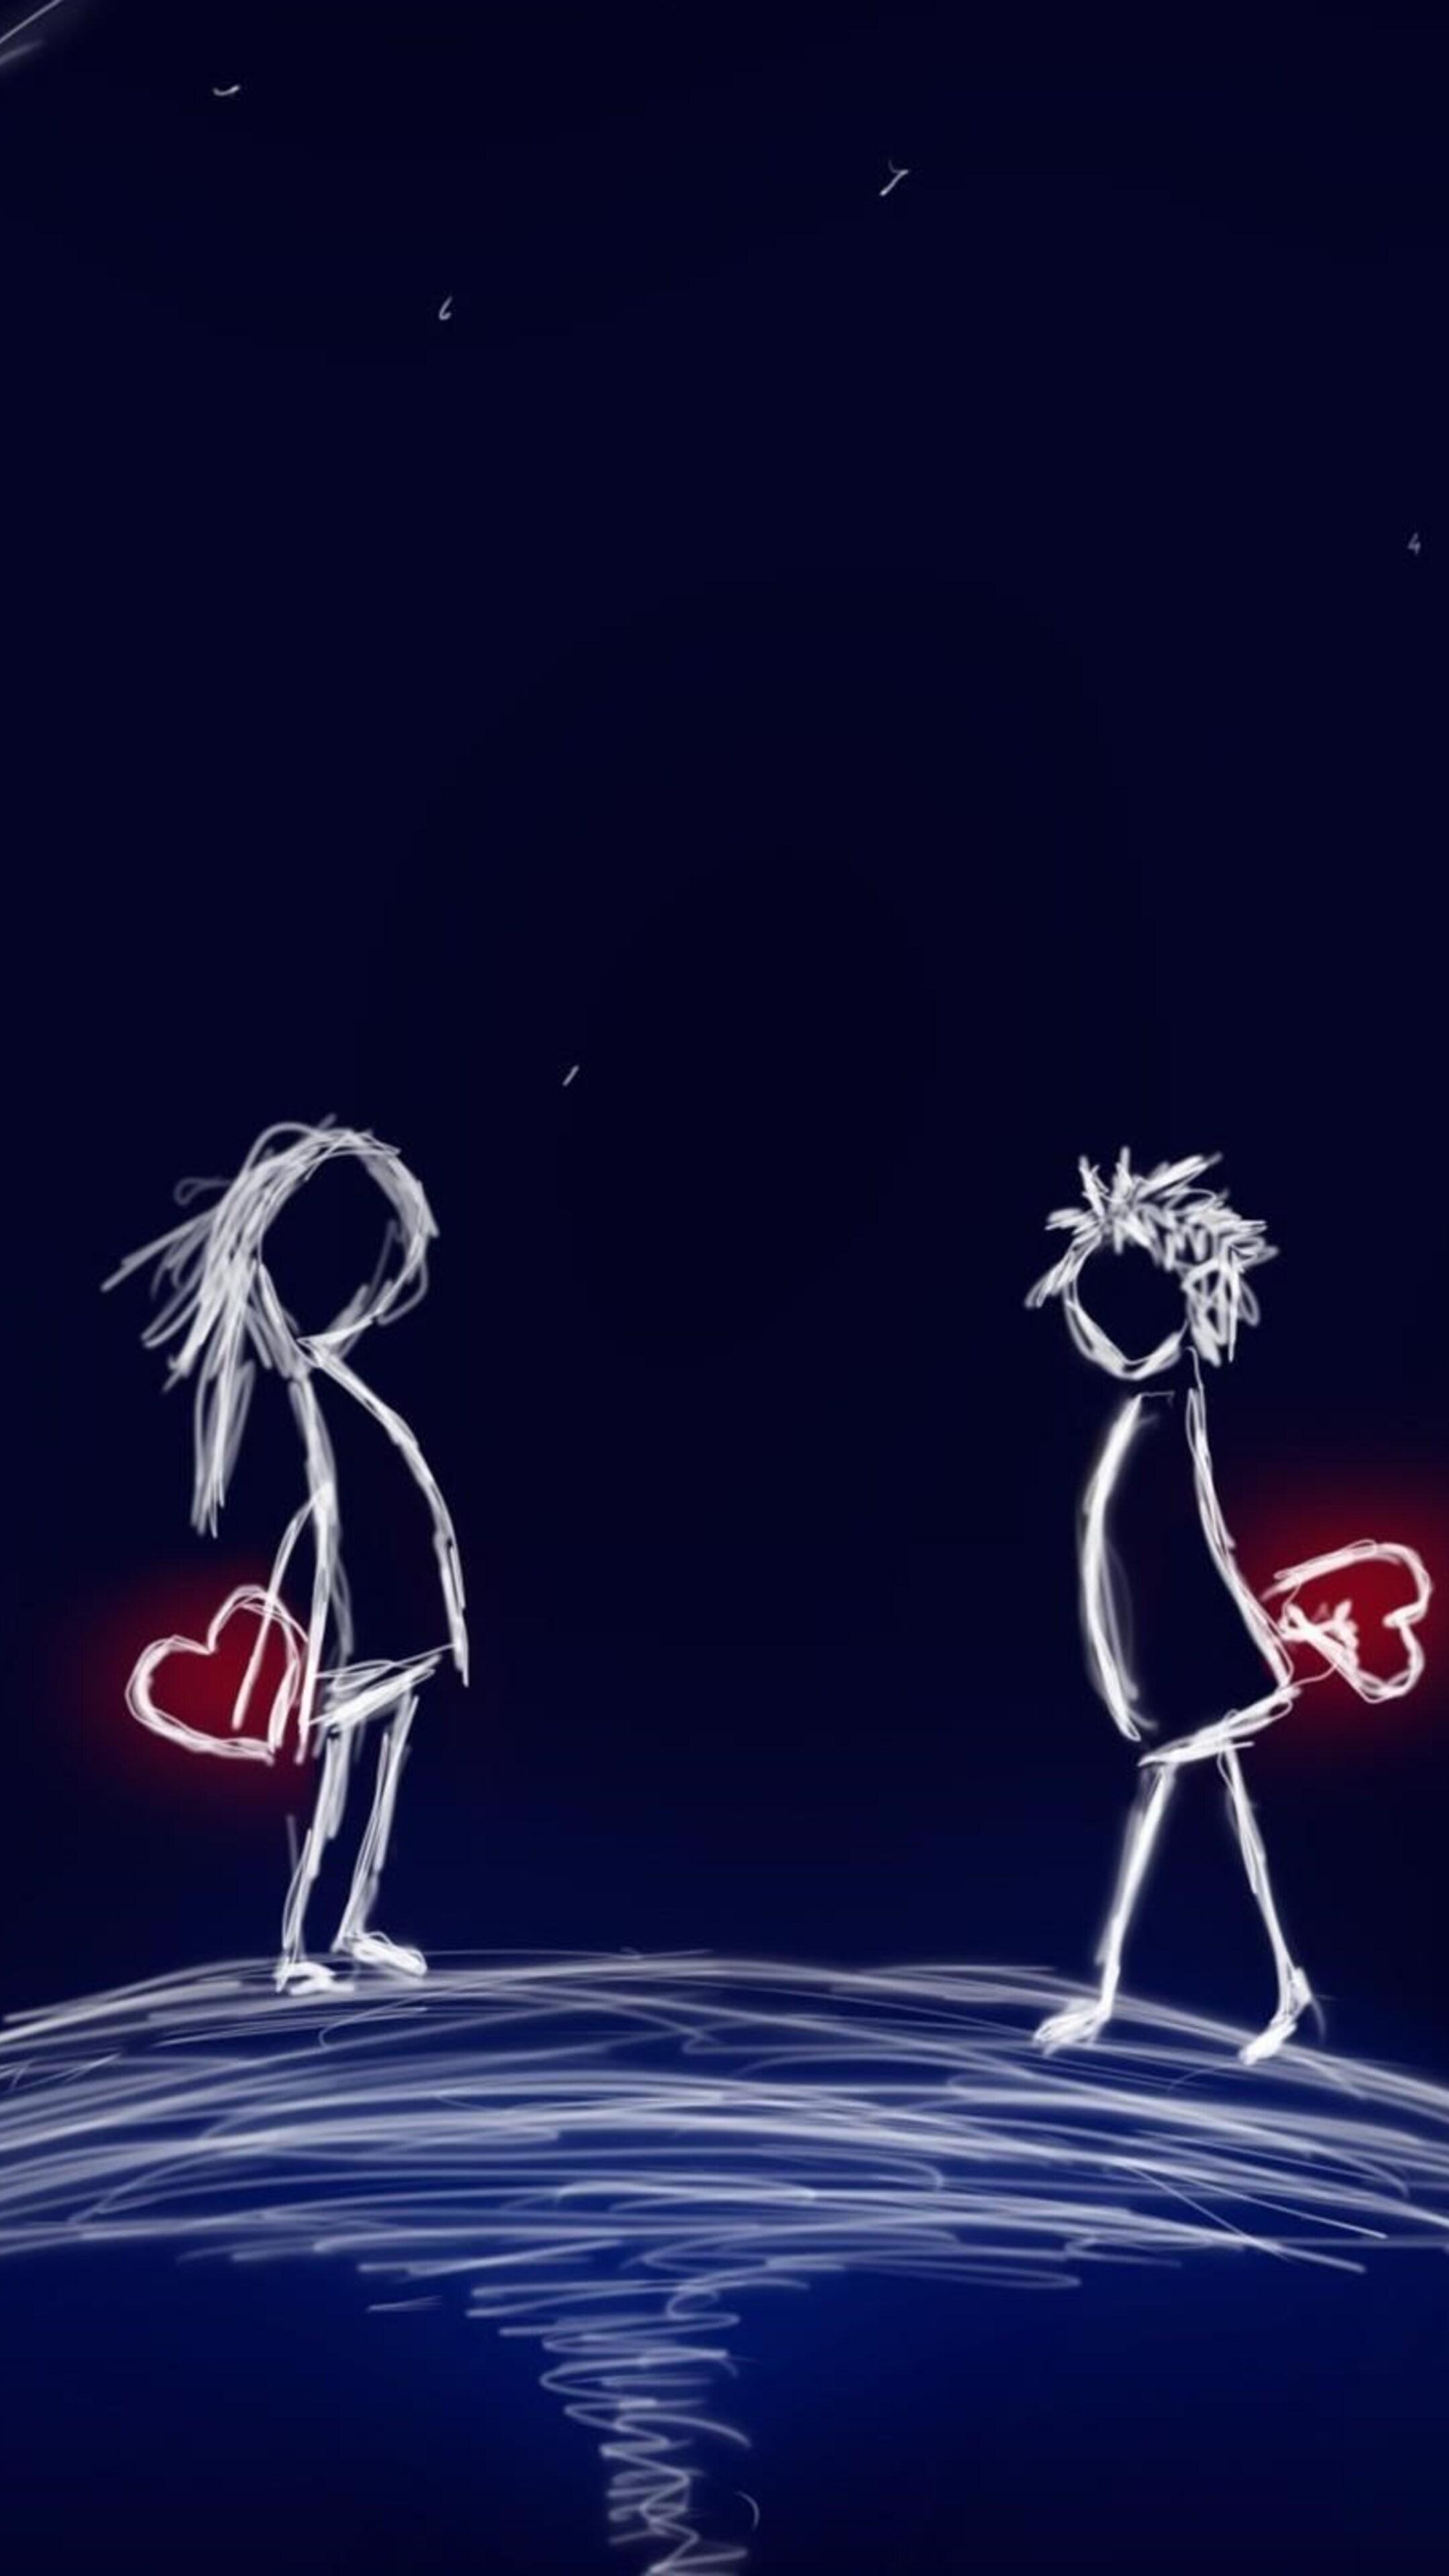 love-digital-art.jpg